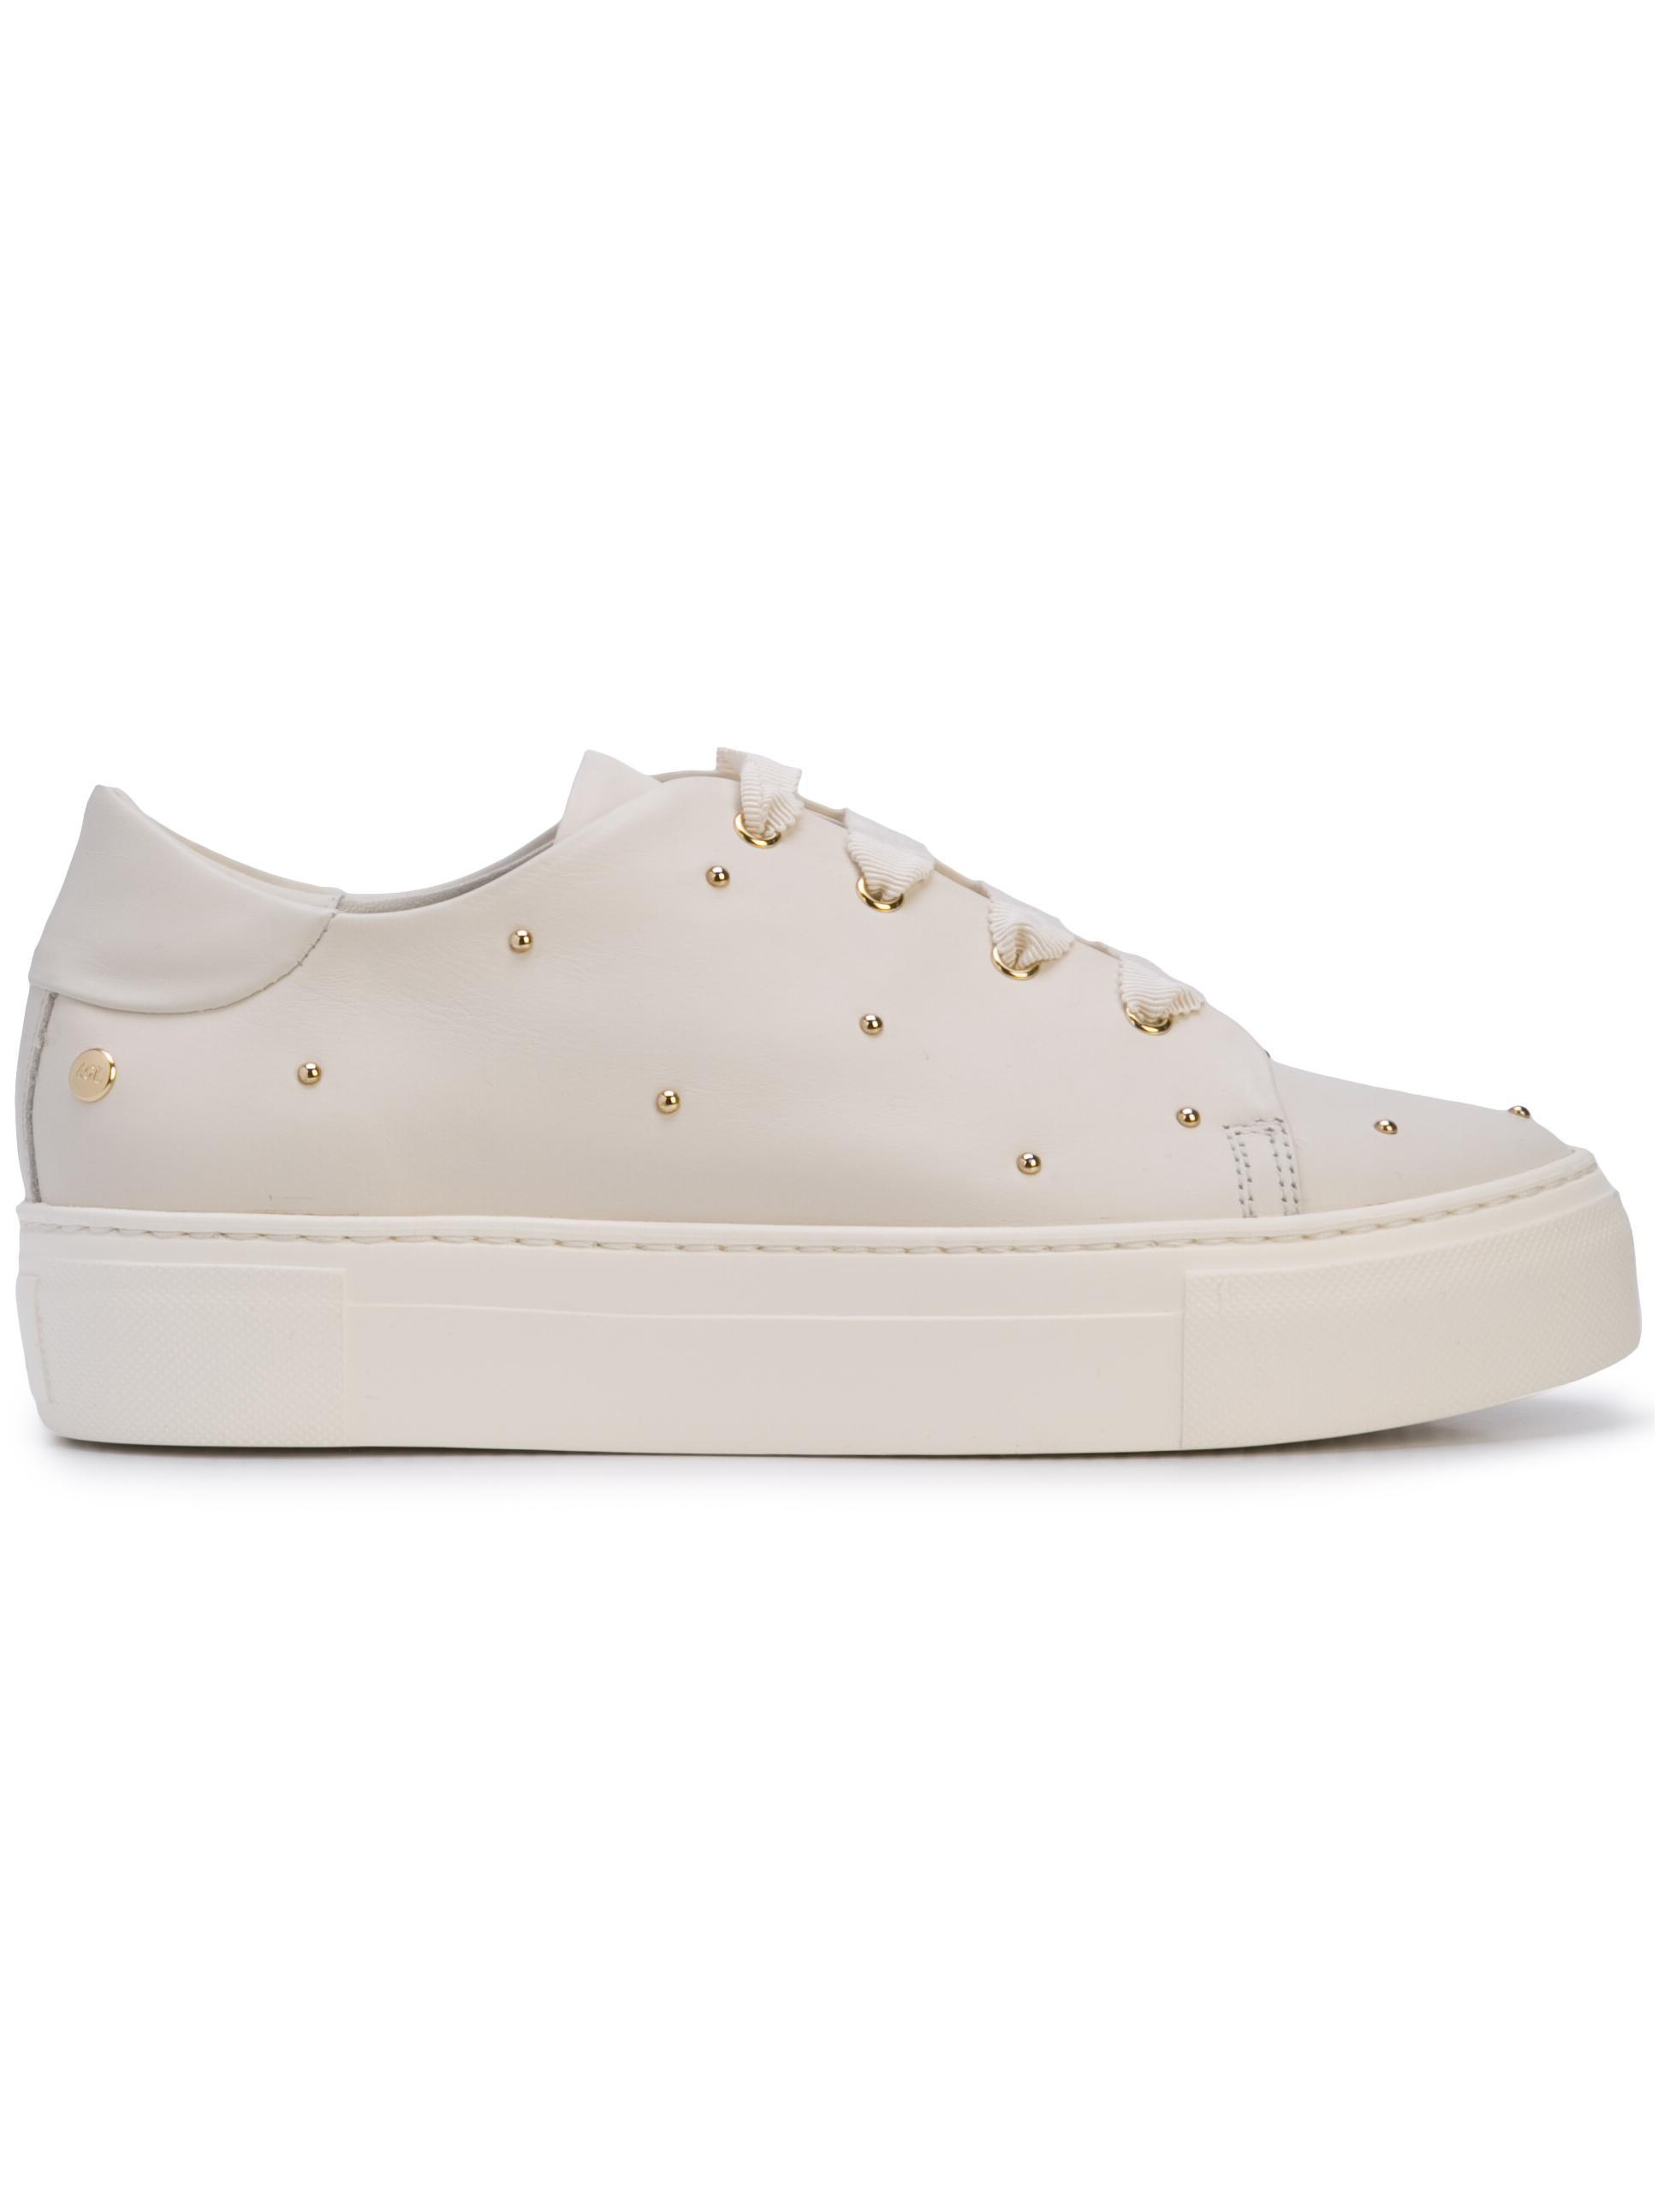 Gold Stud Sneaker Item # D925163